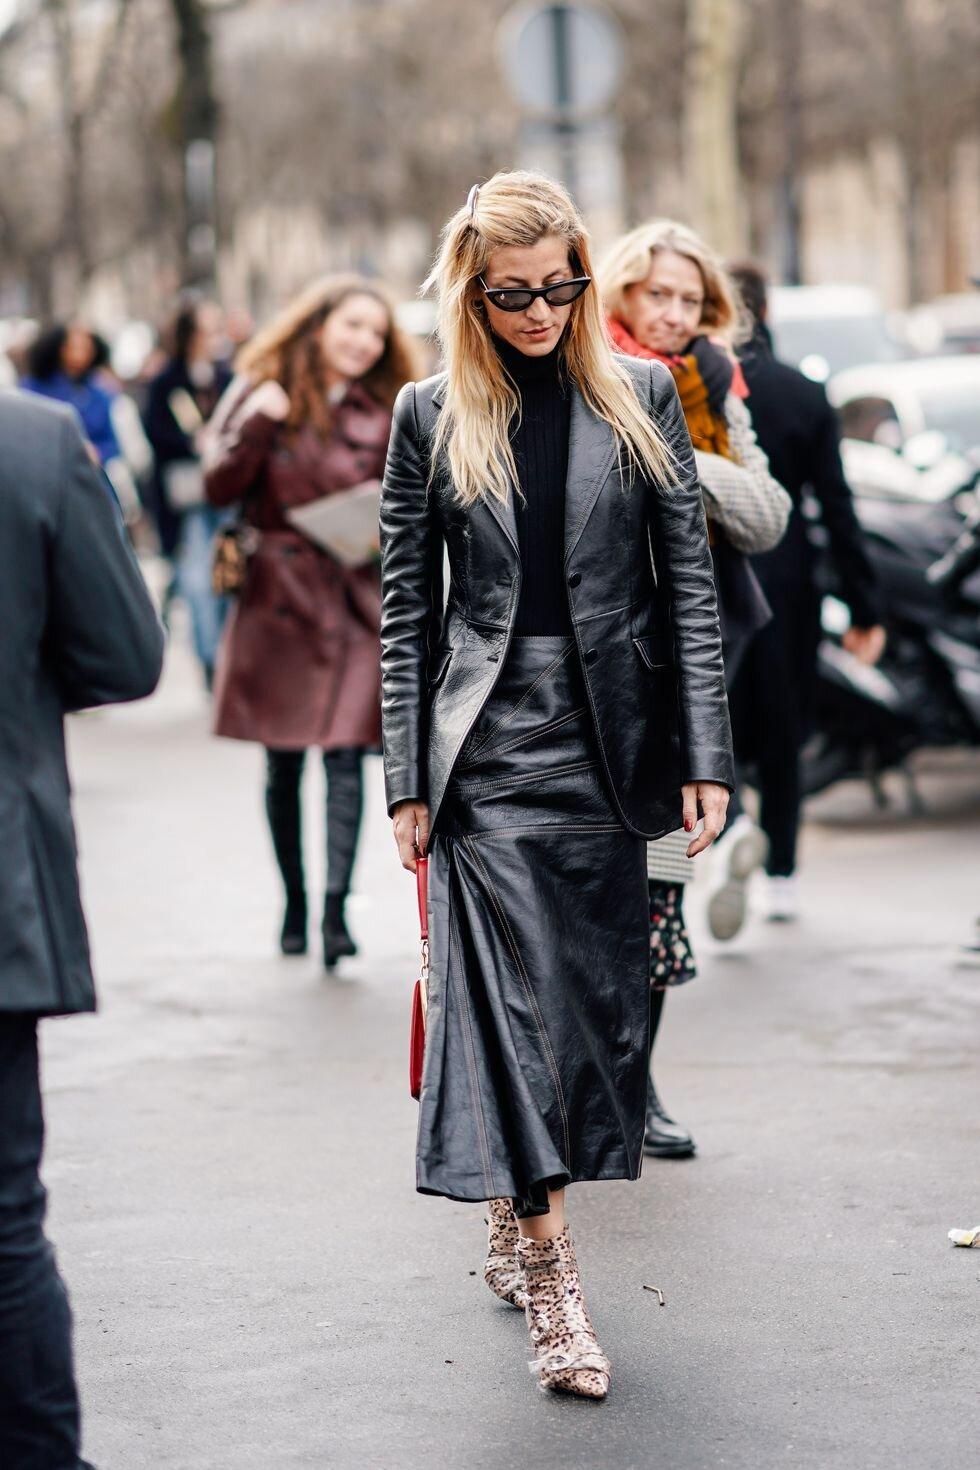 guest-wears-sunglasses-a-black-turtleneck-a-black-leather-news-photo-1134185118-1563482951.jpg